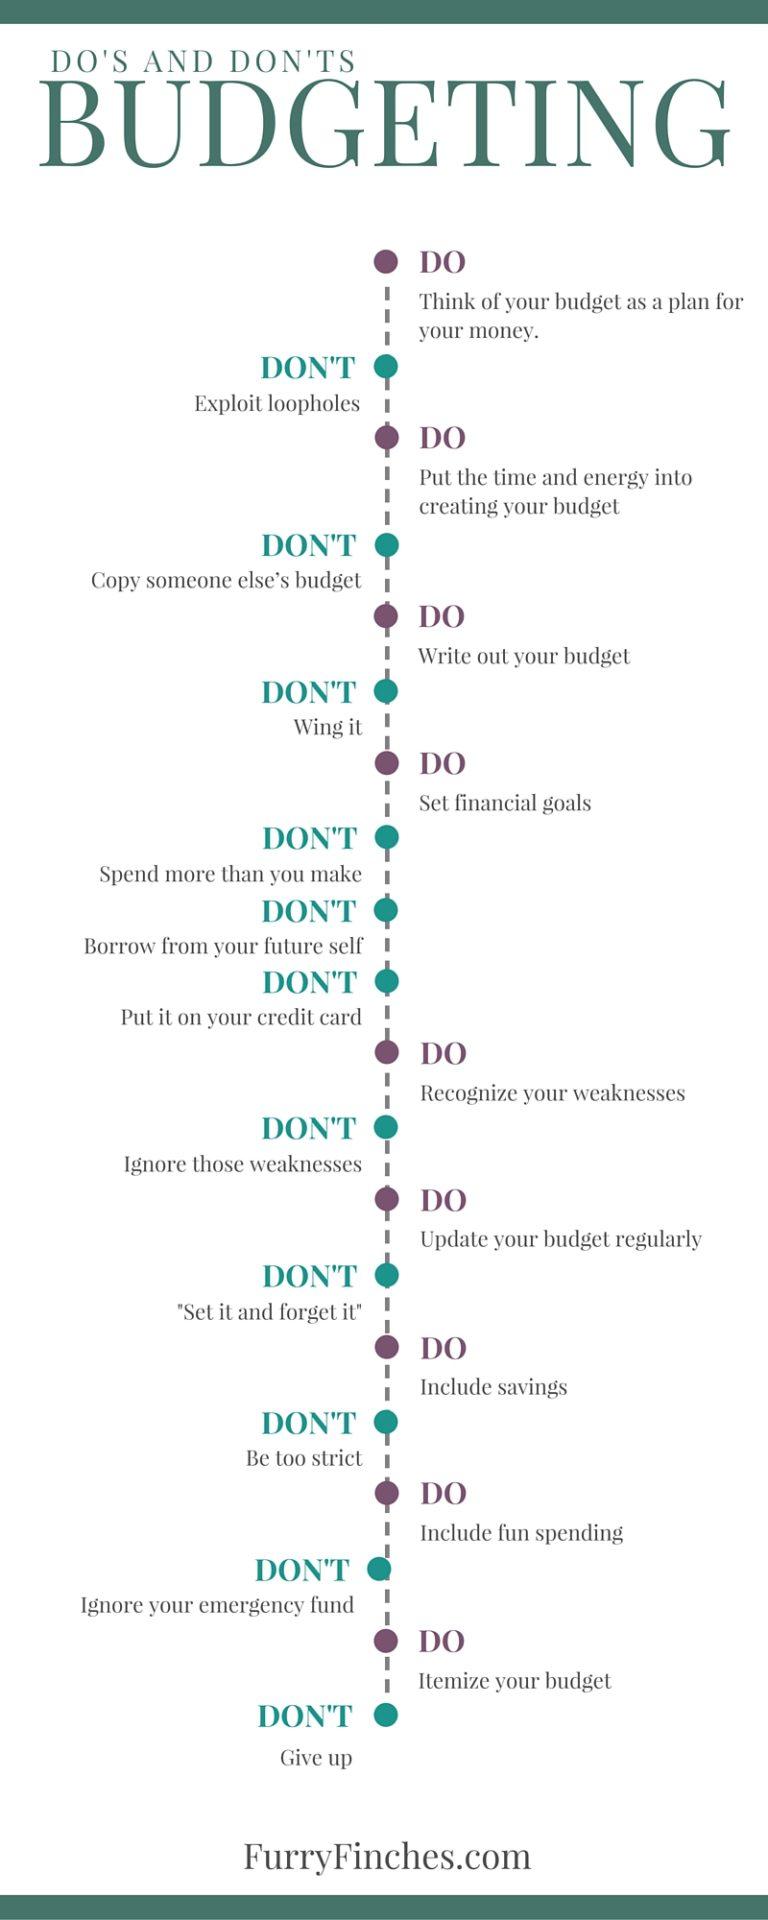 Budgeting Infographic